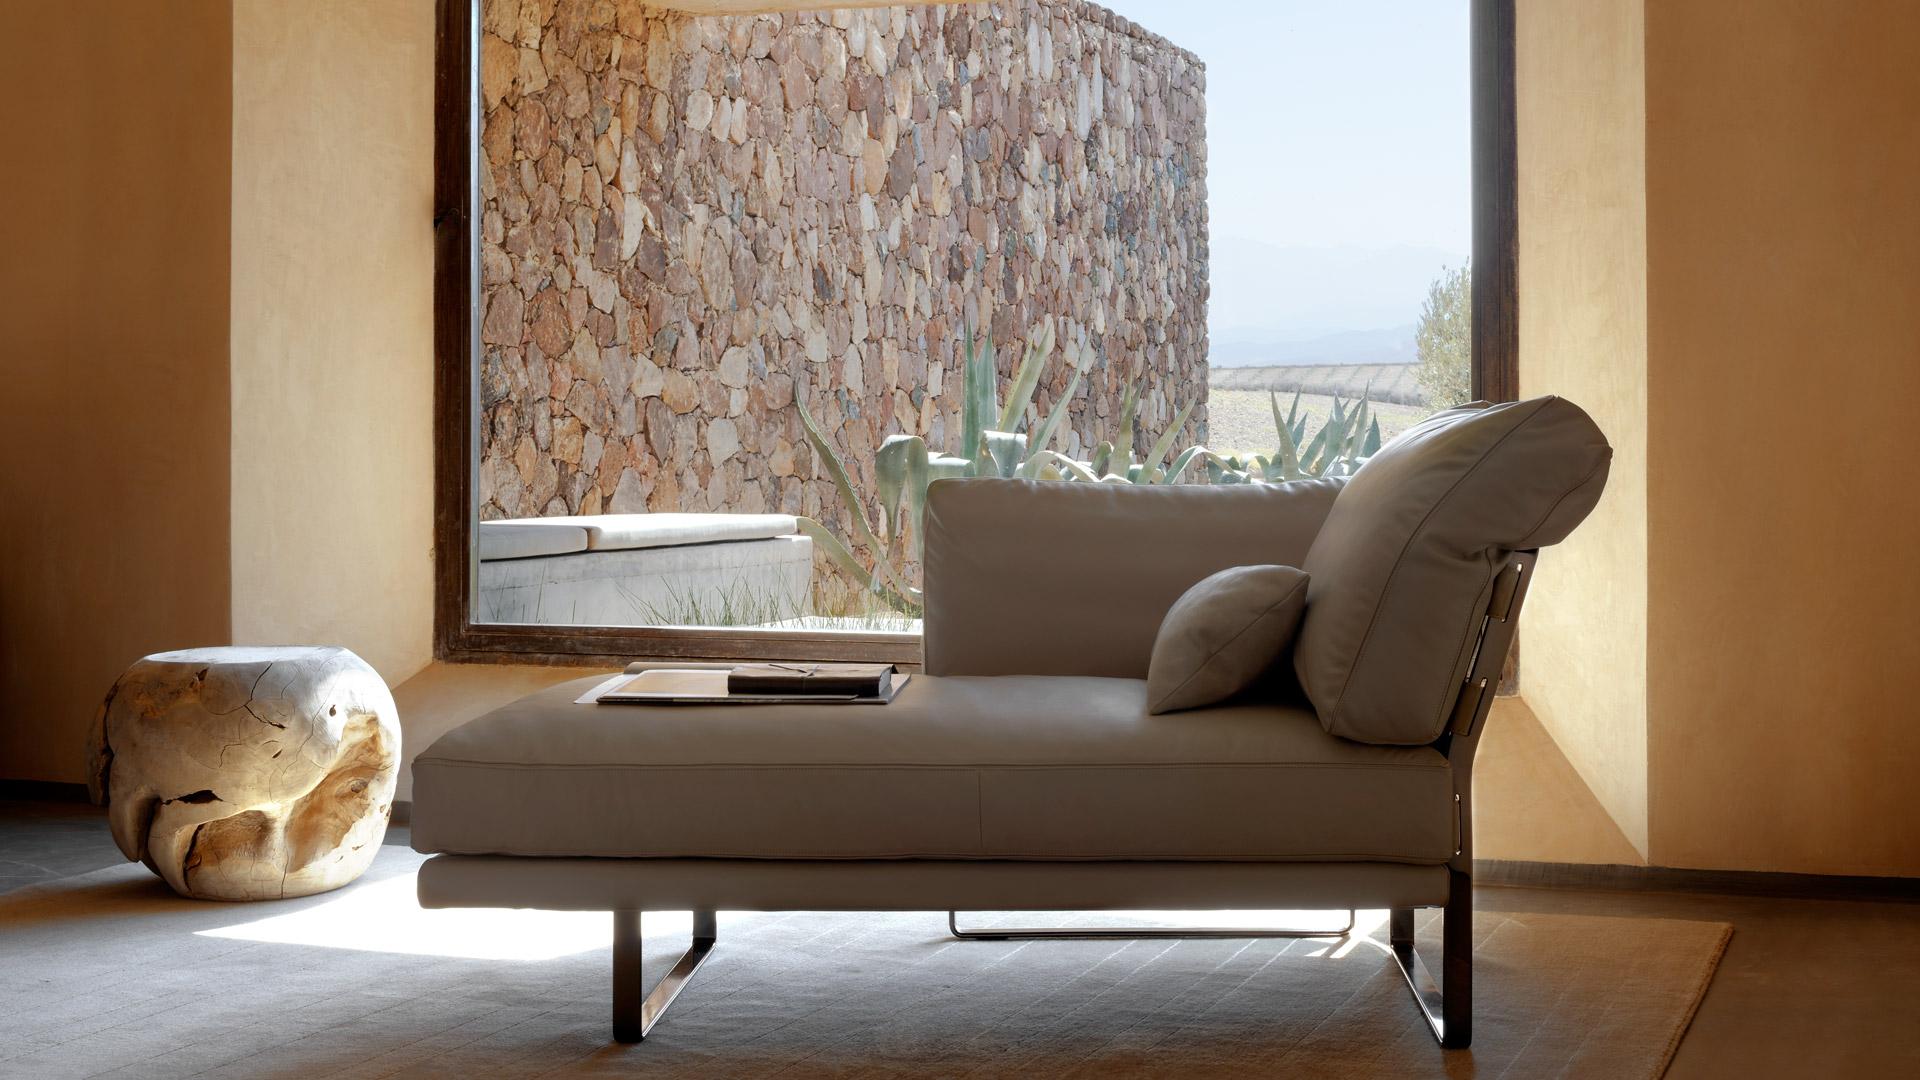 Divani fendi 2013 3 design mon amour - Fendi casa prezzi ...